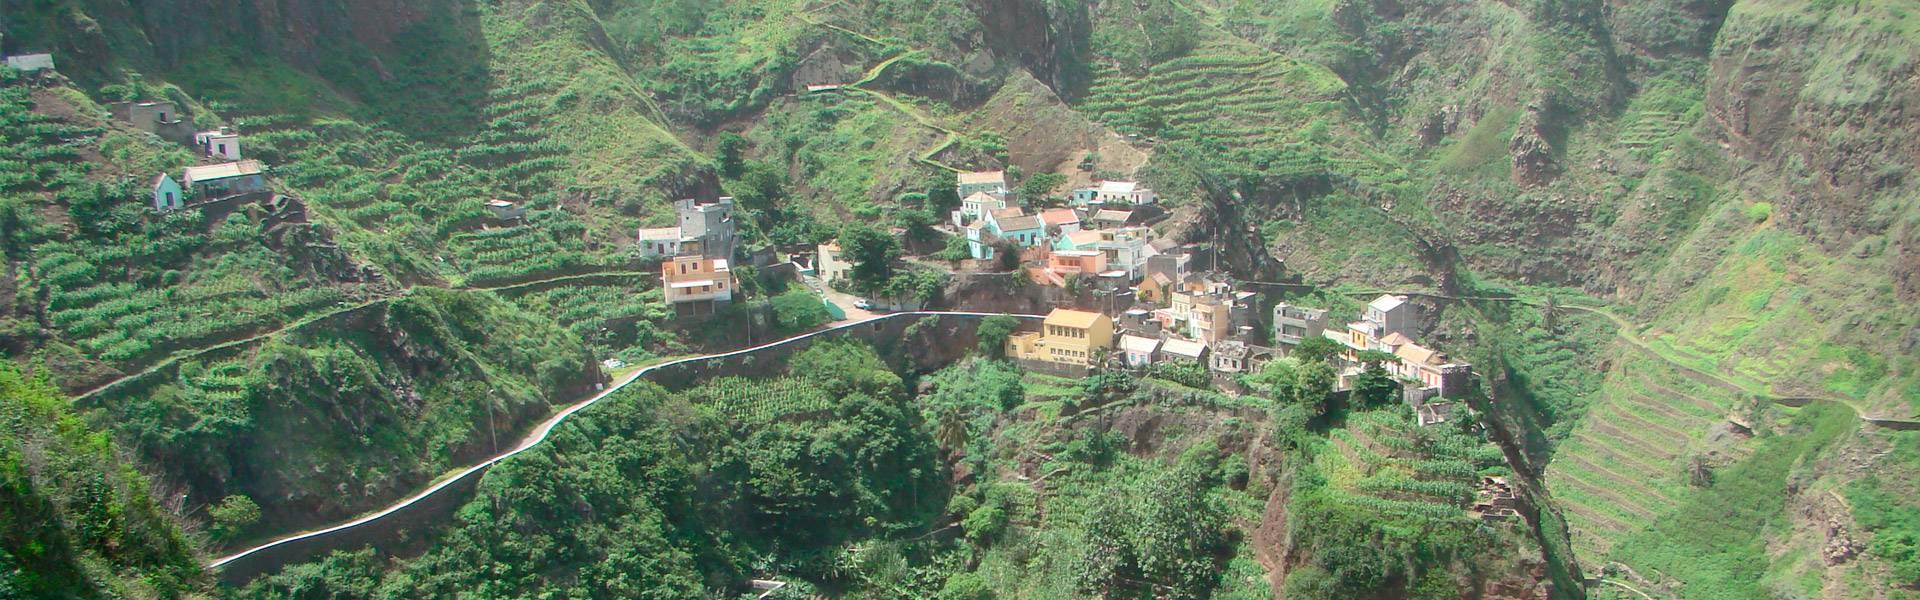 topo-cabo-verde África